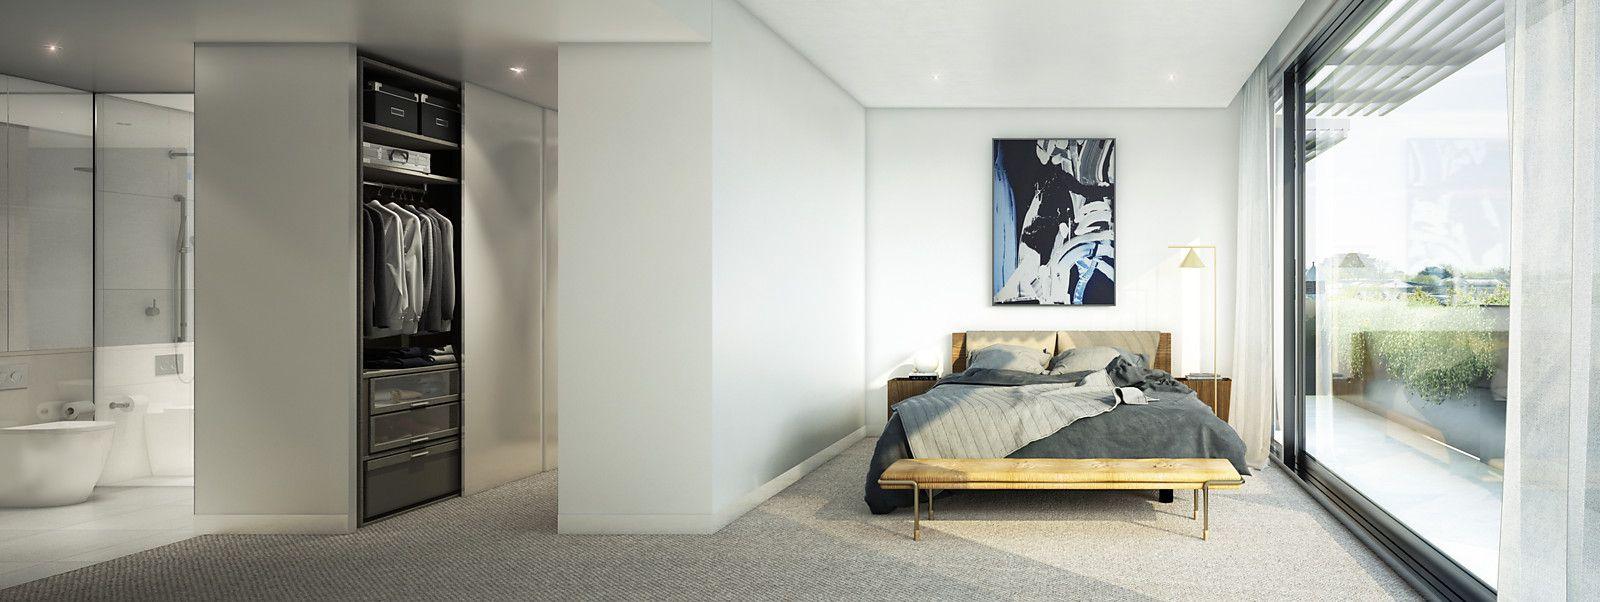 Alara bedroom